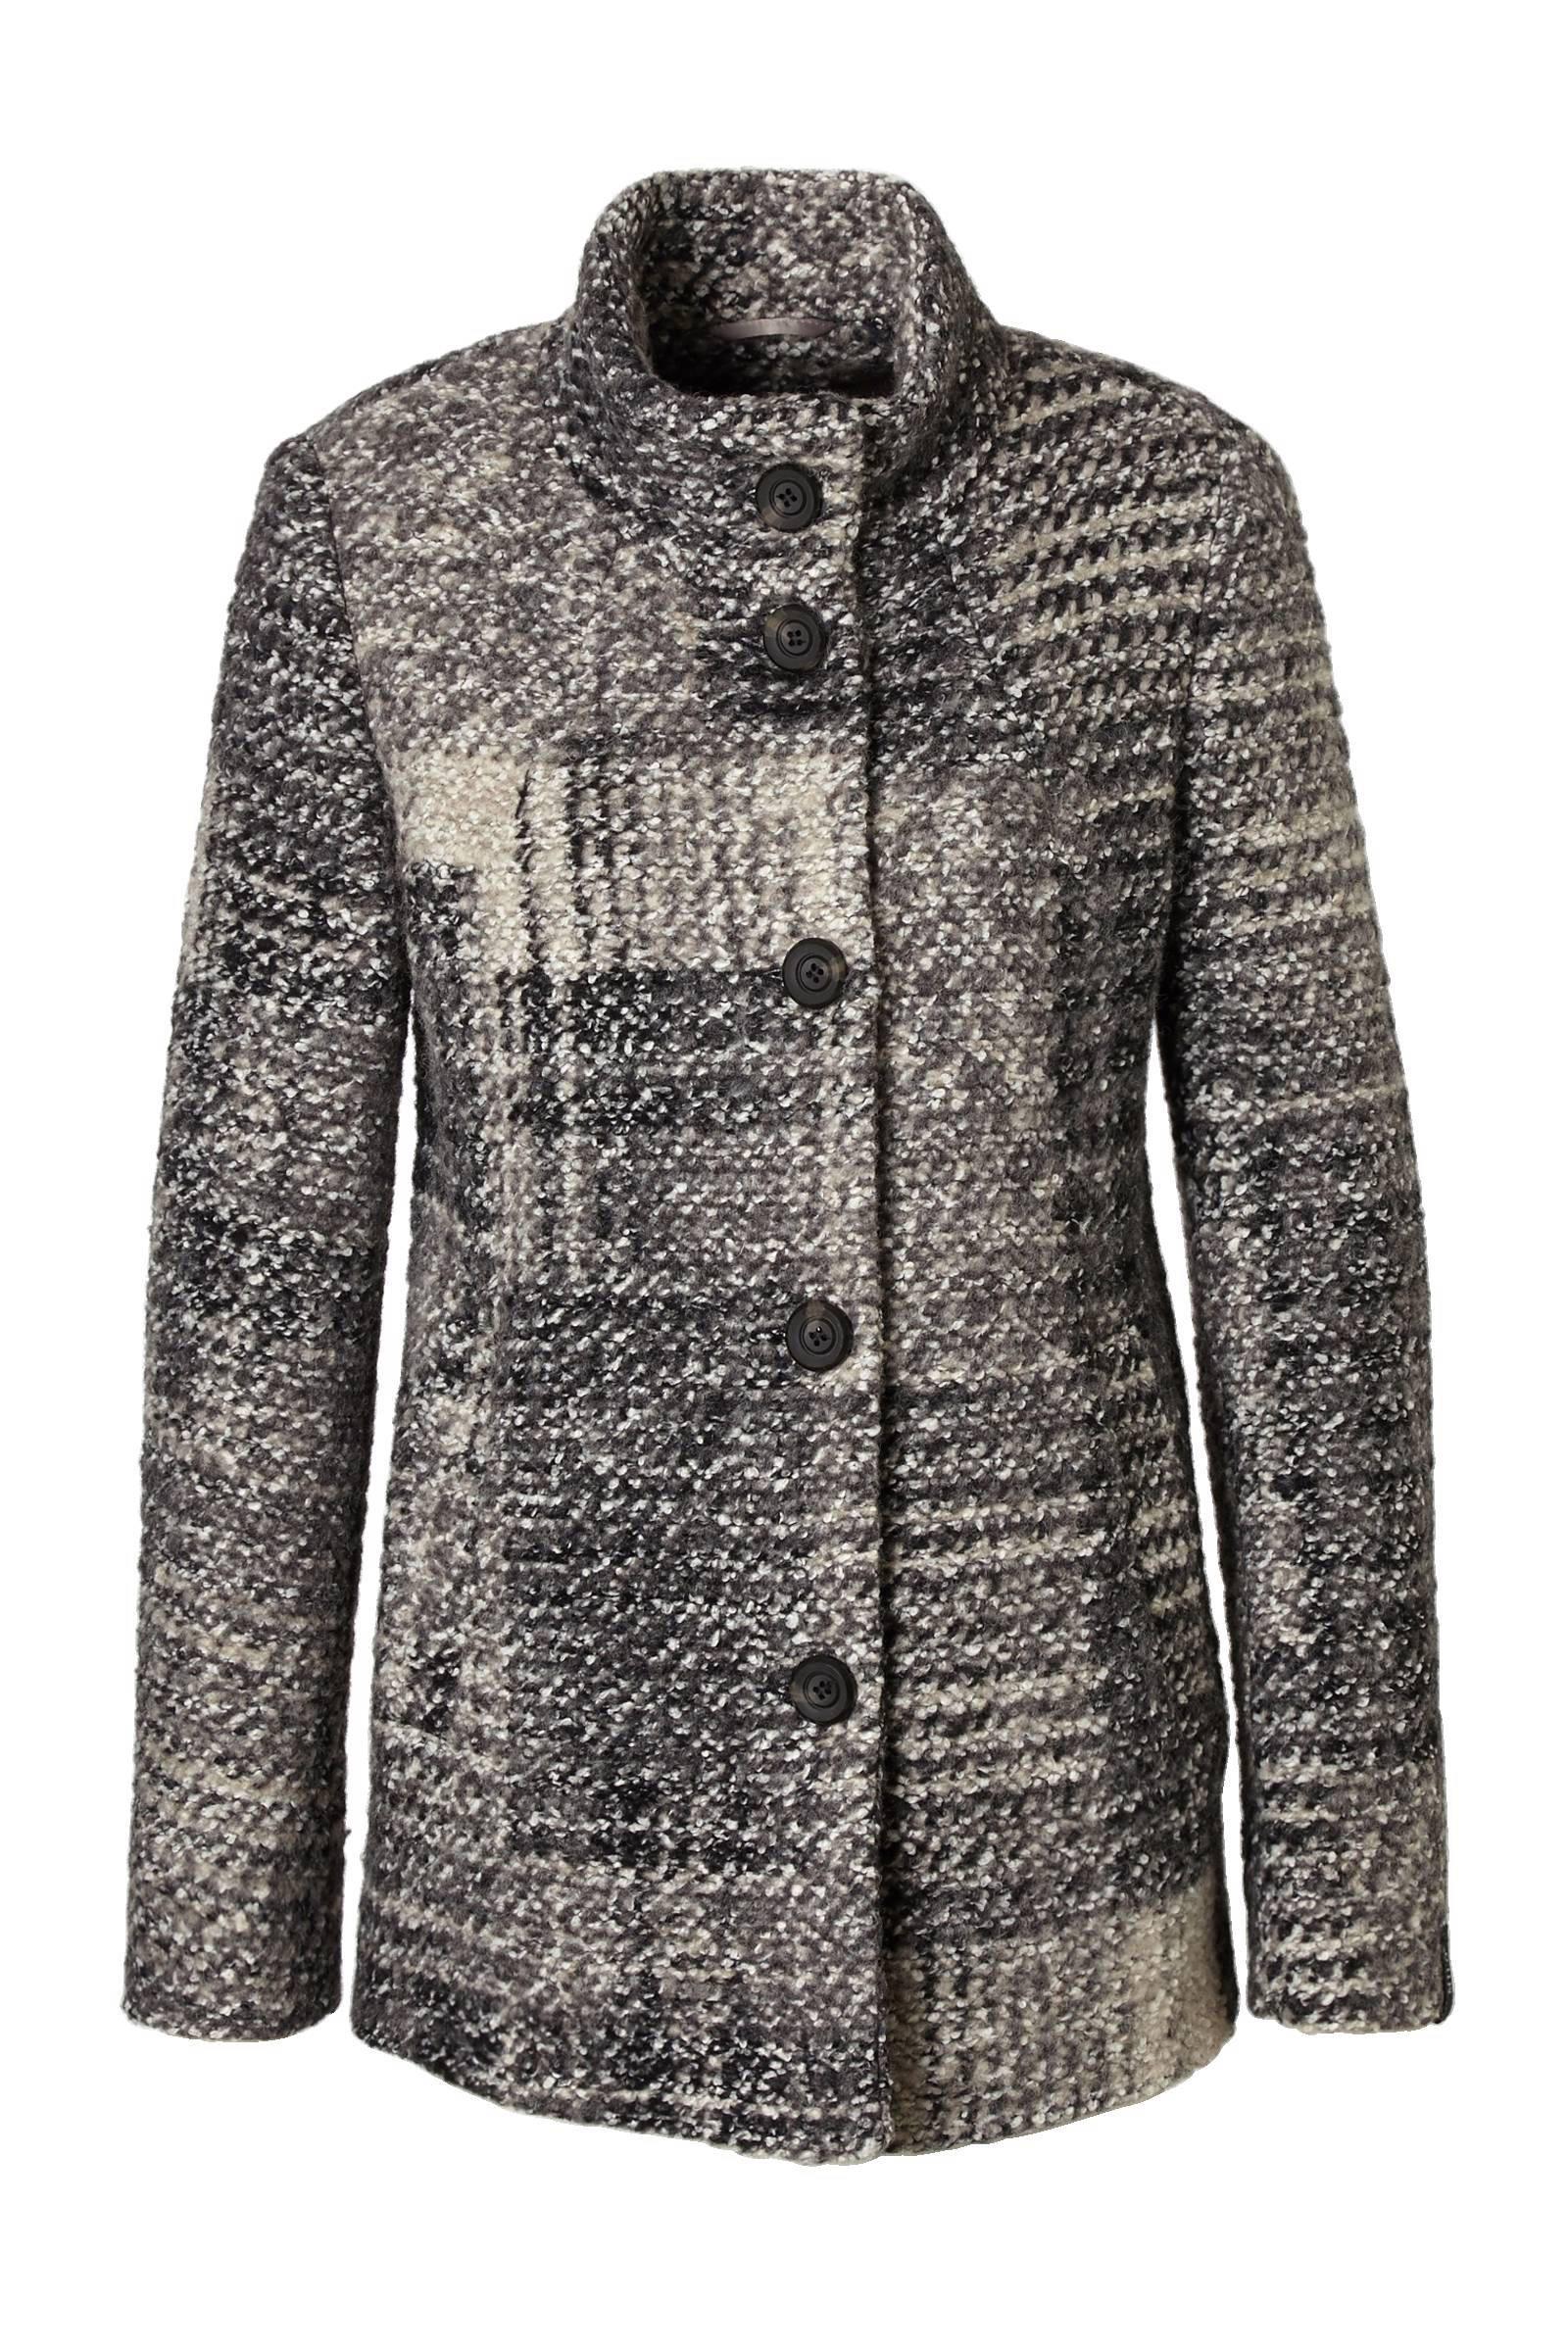 MILO bouclé jas met wol | wehkamp